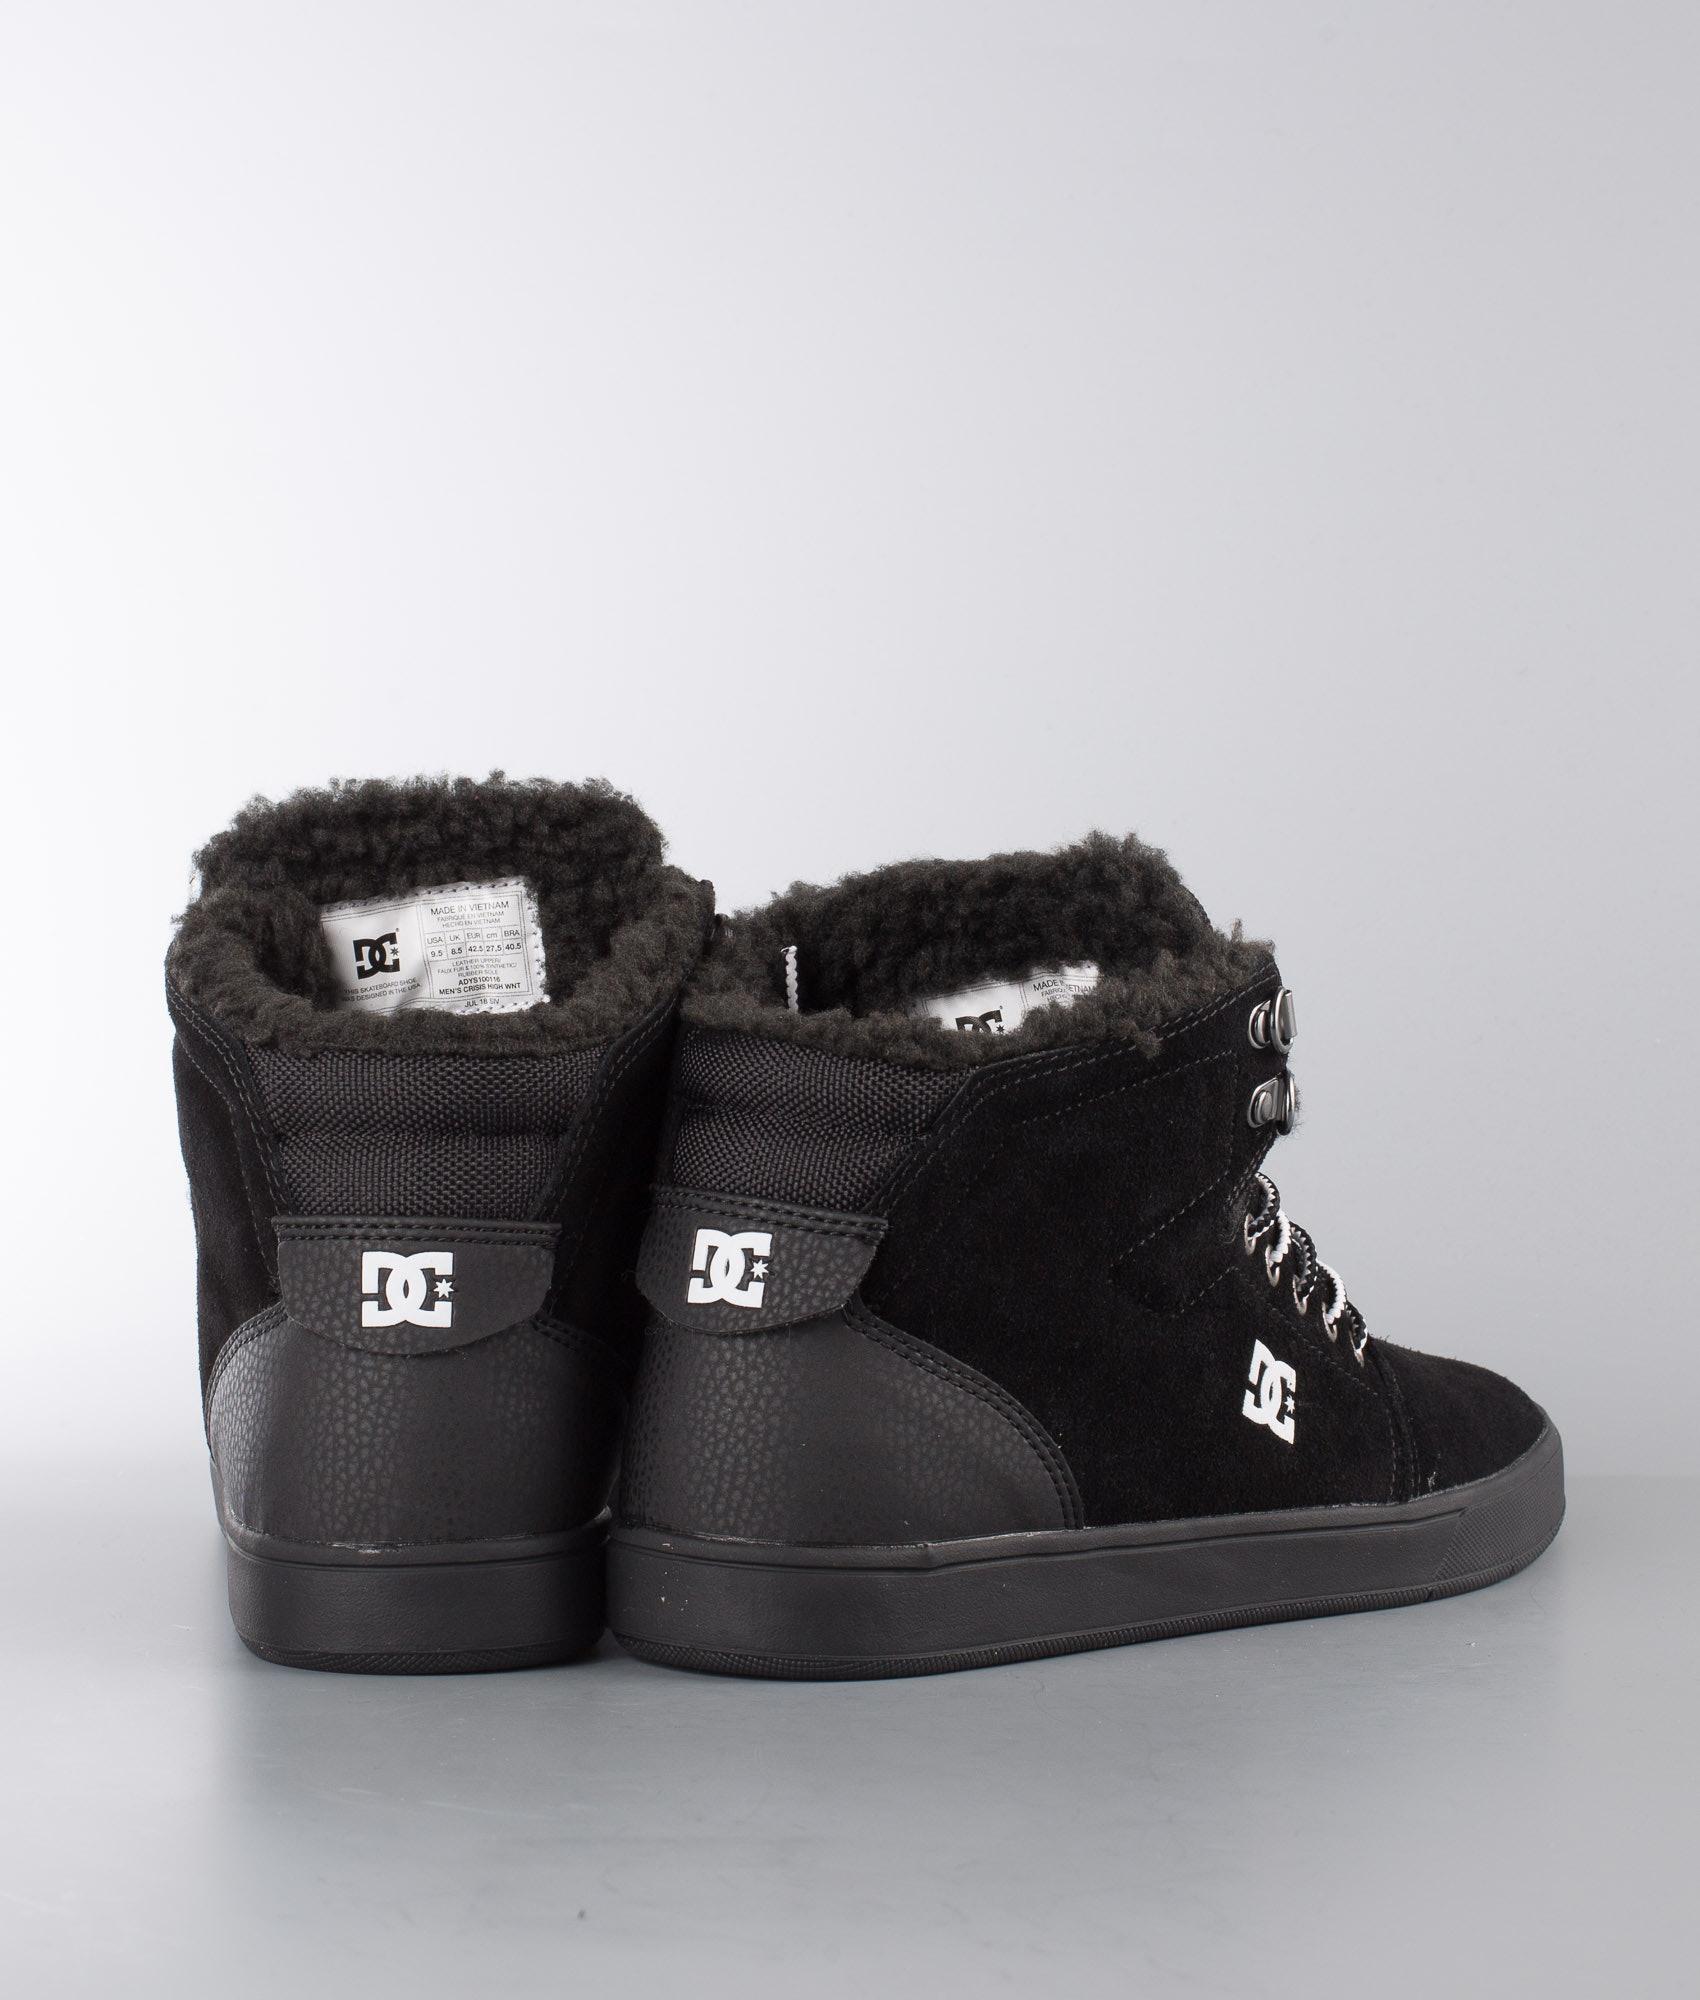 6aef8c1525 DC Crisis High Wnt Shoes Black White Black - Ridestore.com